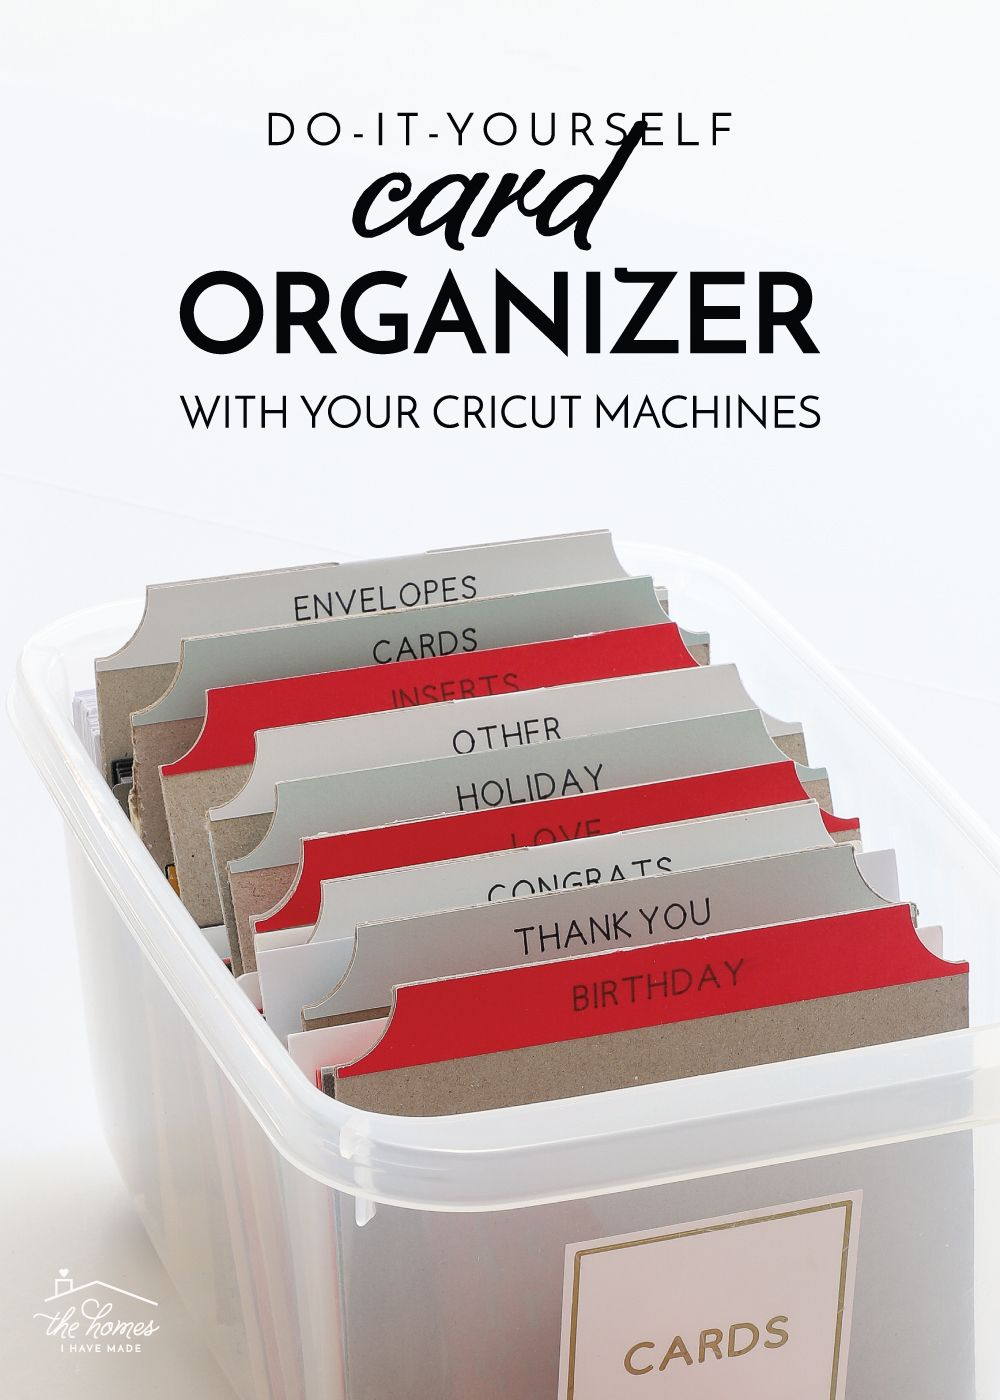 Diy Card Organizer With Your Cricut Machine The Homes I Have Made Card Organizer Diy Cards Cricut Cards